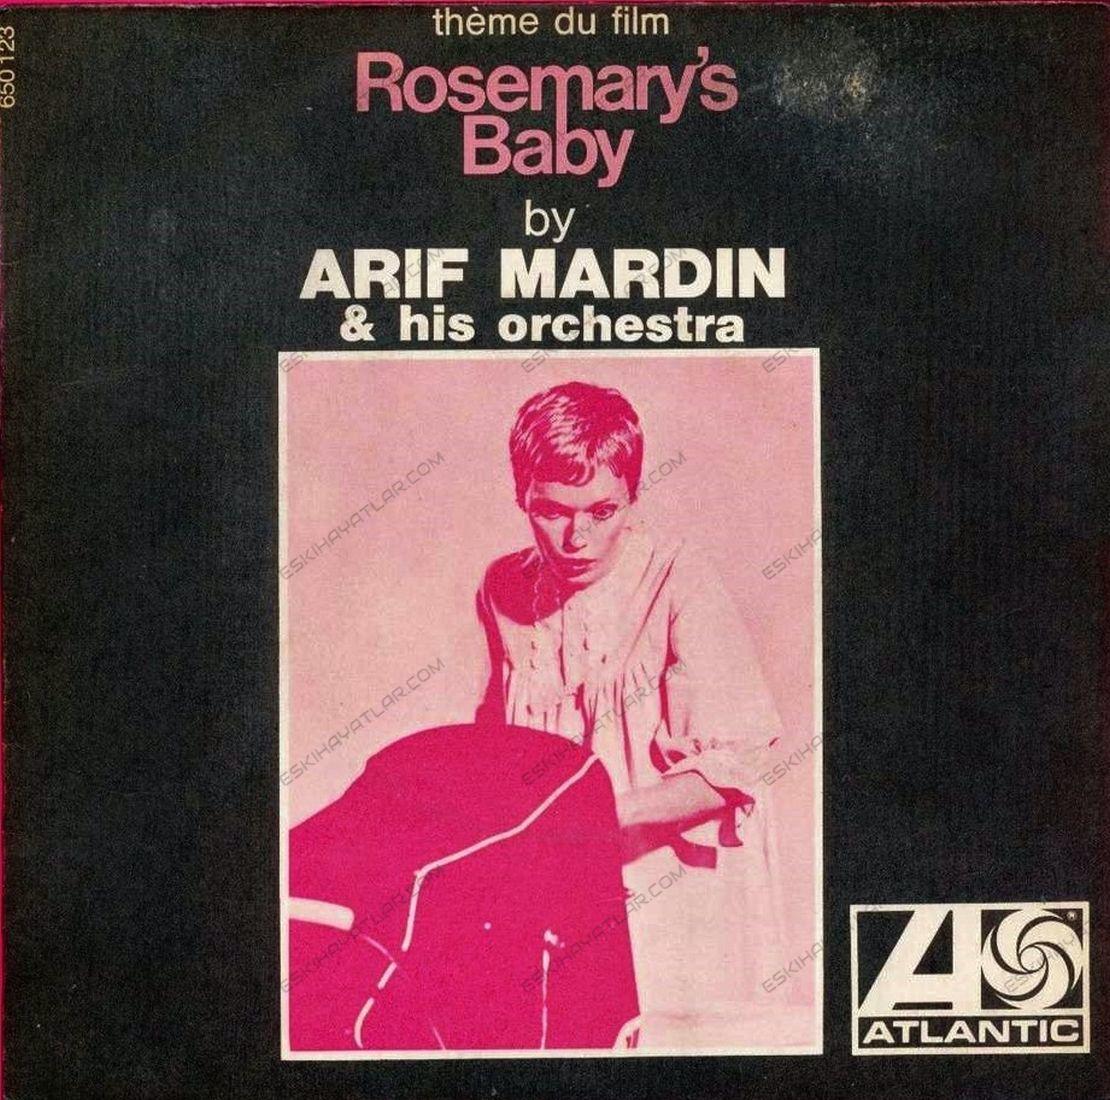 0261-arif-mardin-kimdir-arif-mardin-produktorlugu-amerikan-pop-muzigin-turk-produktoru-atlantic-records-ebul-ula-mardin (3)